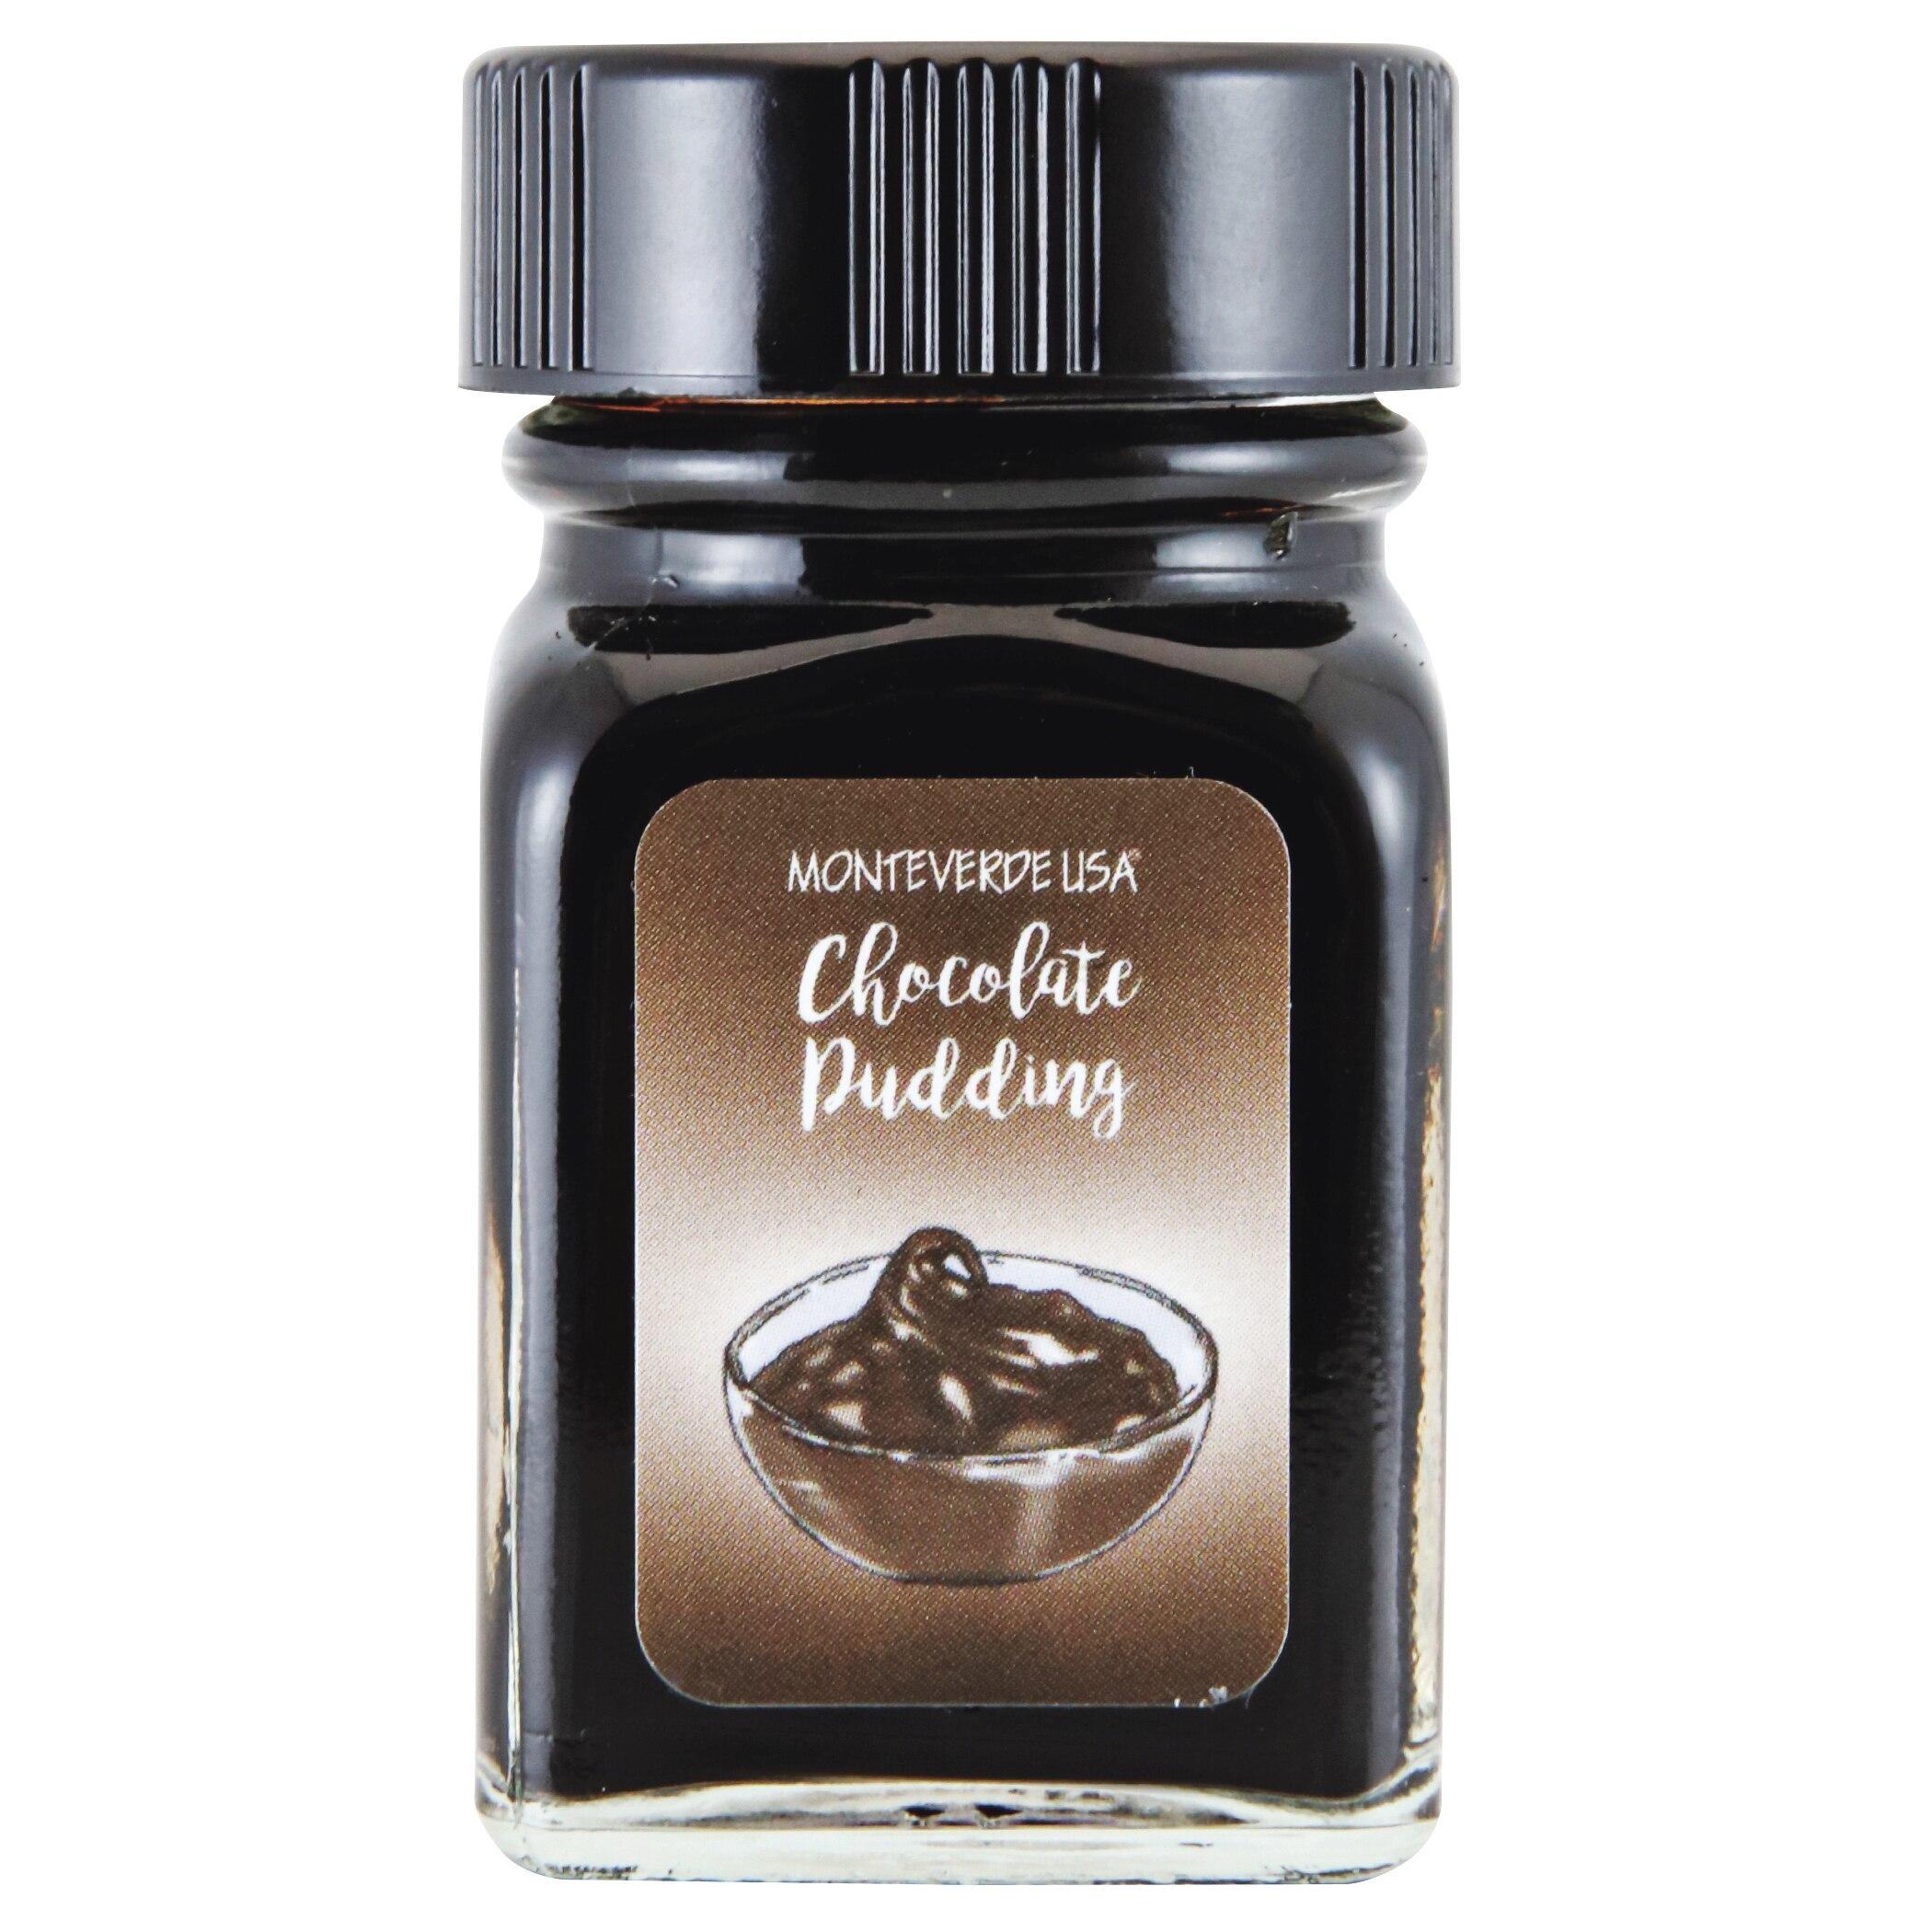 Monteverde Sweet LIfe - Chocolate Pudding 30ml